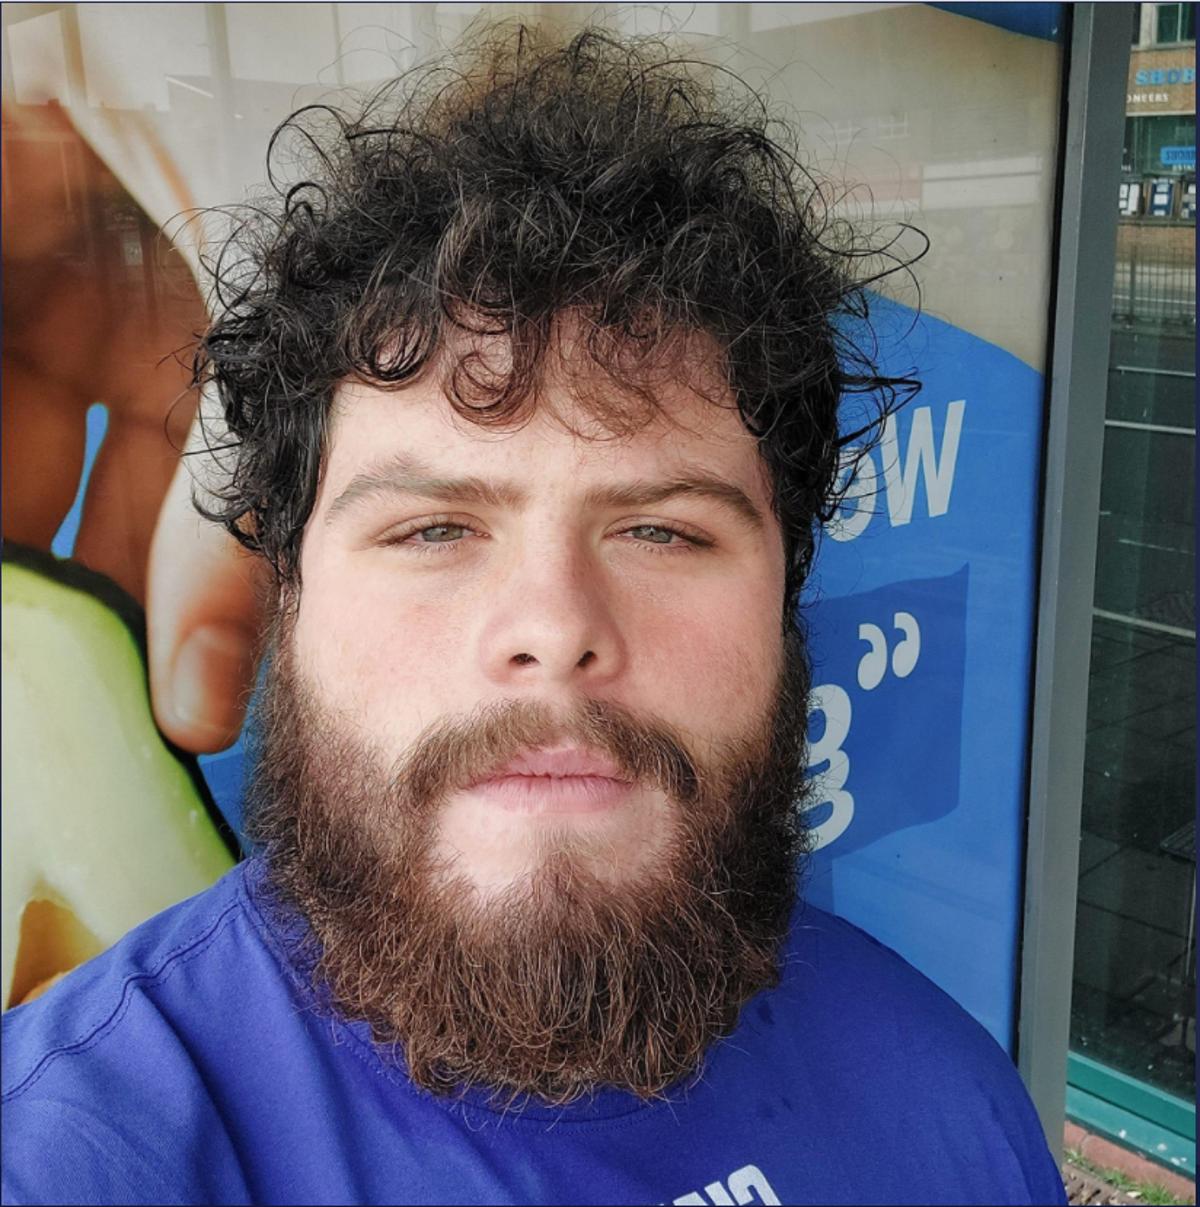 Jake Davison named locally as Plymouth shooter